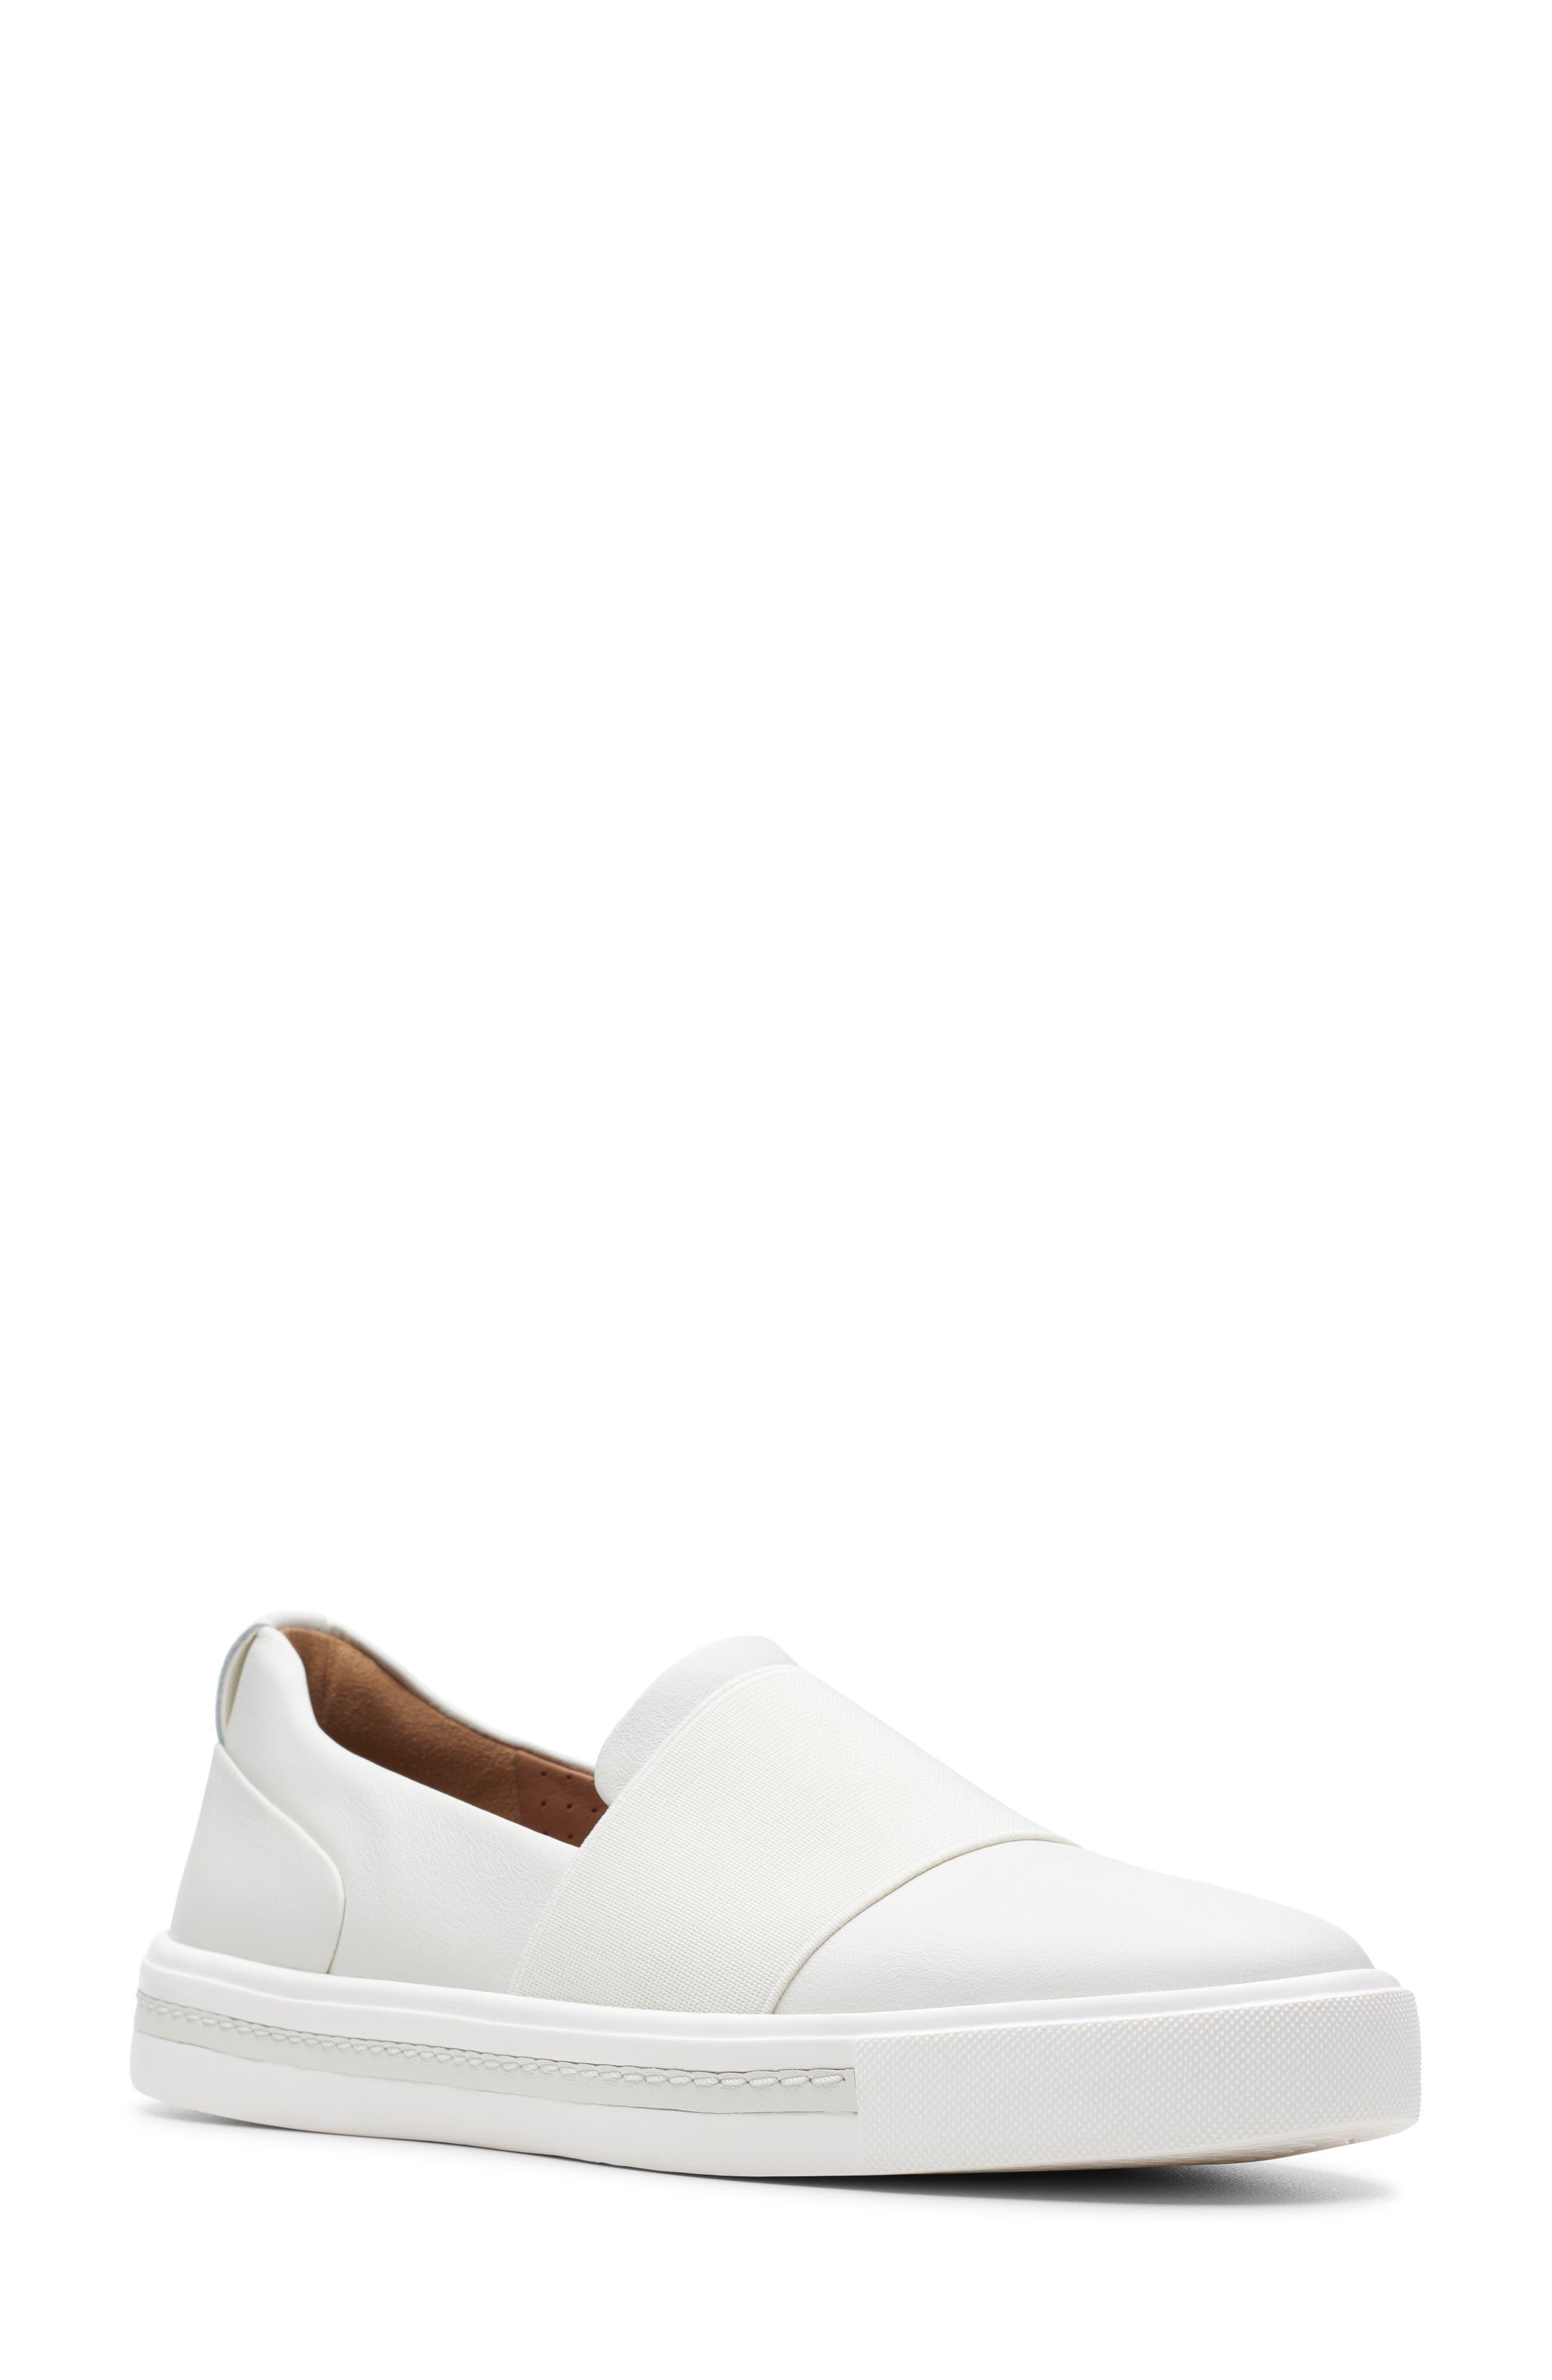 Women's Clarks® Sneakers \u0026 Athletic